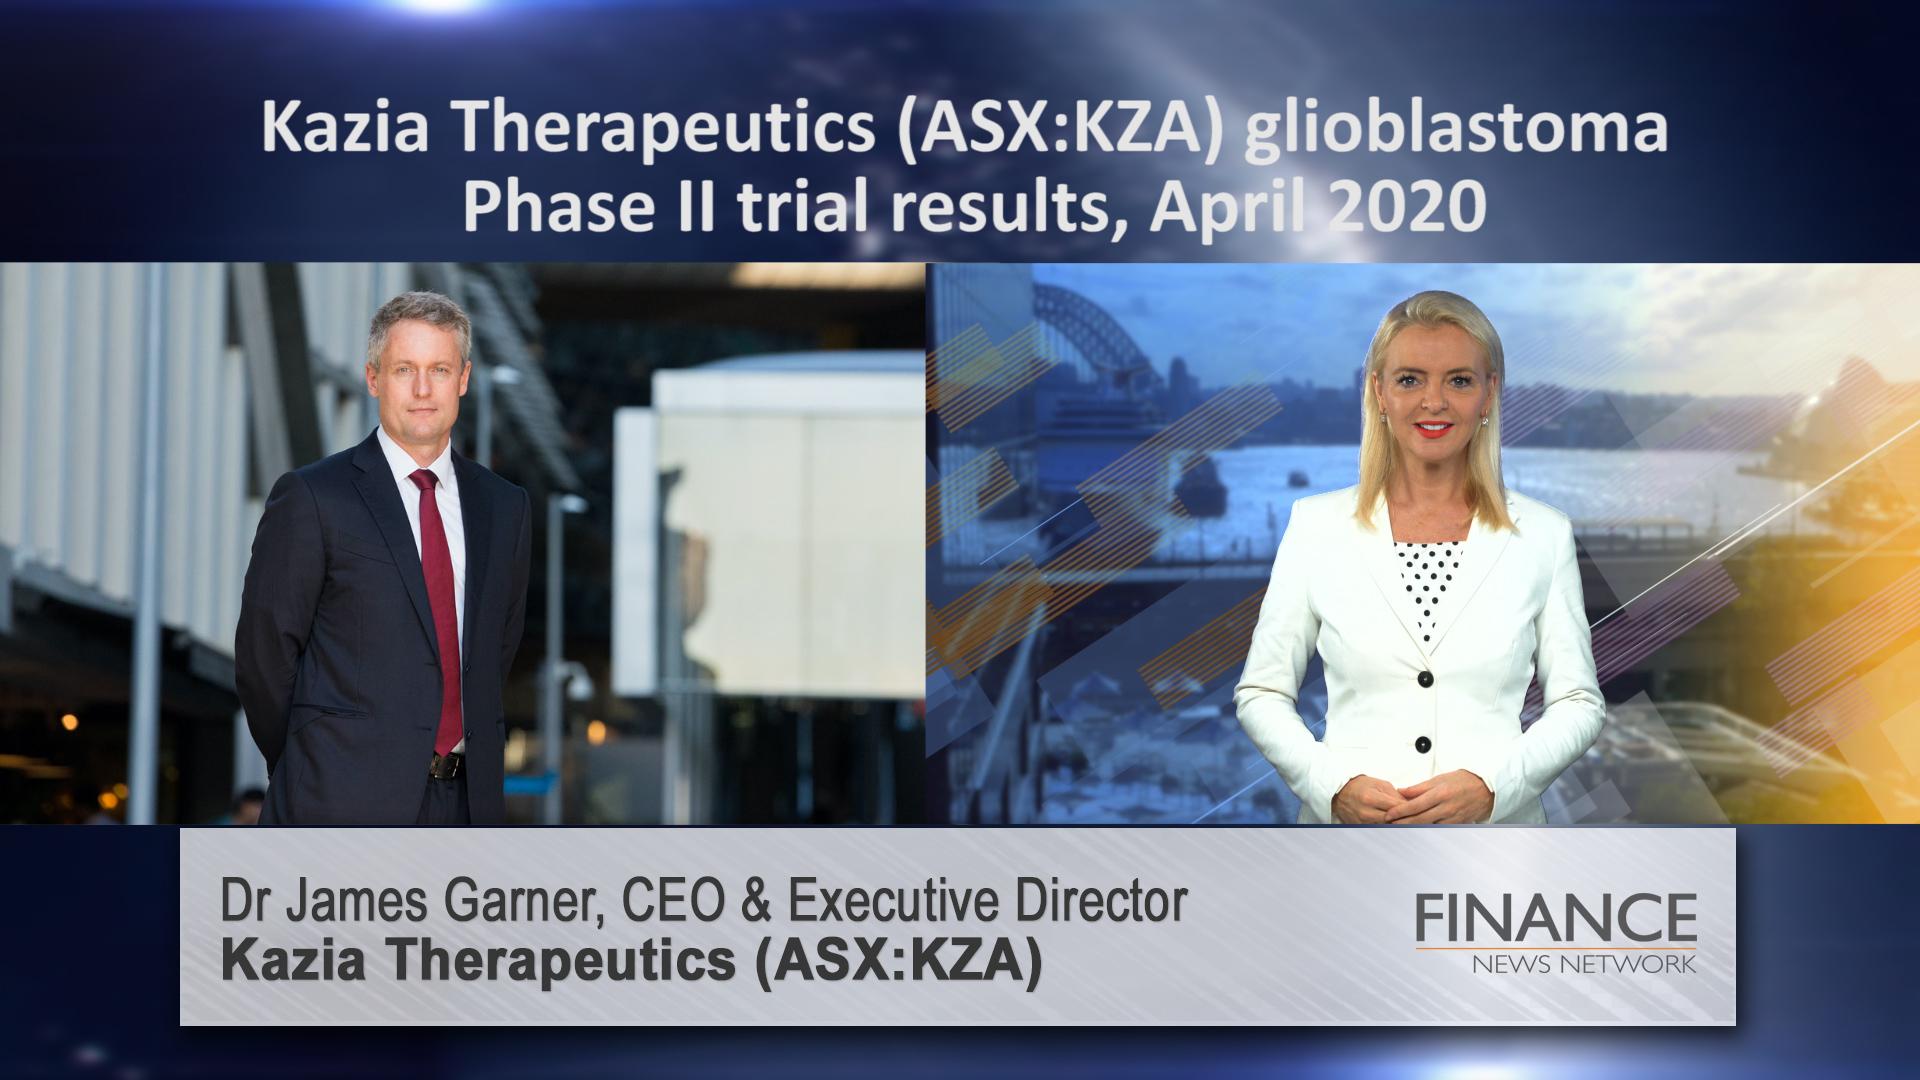 Kazia Therapeutics (ASX:KZA) glioblastoma Phase II trial results